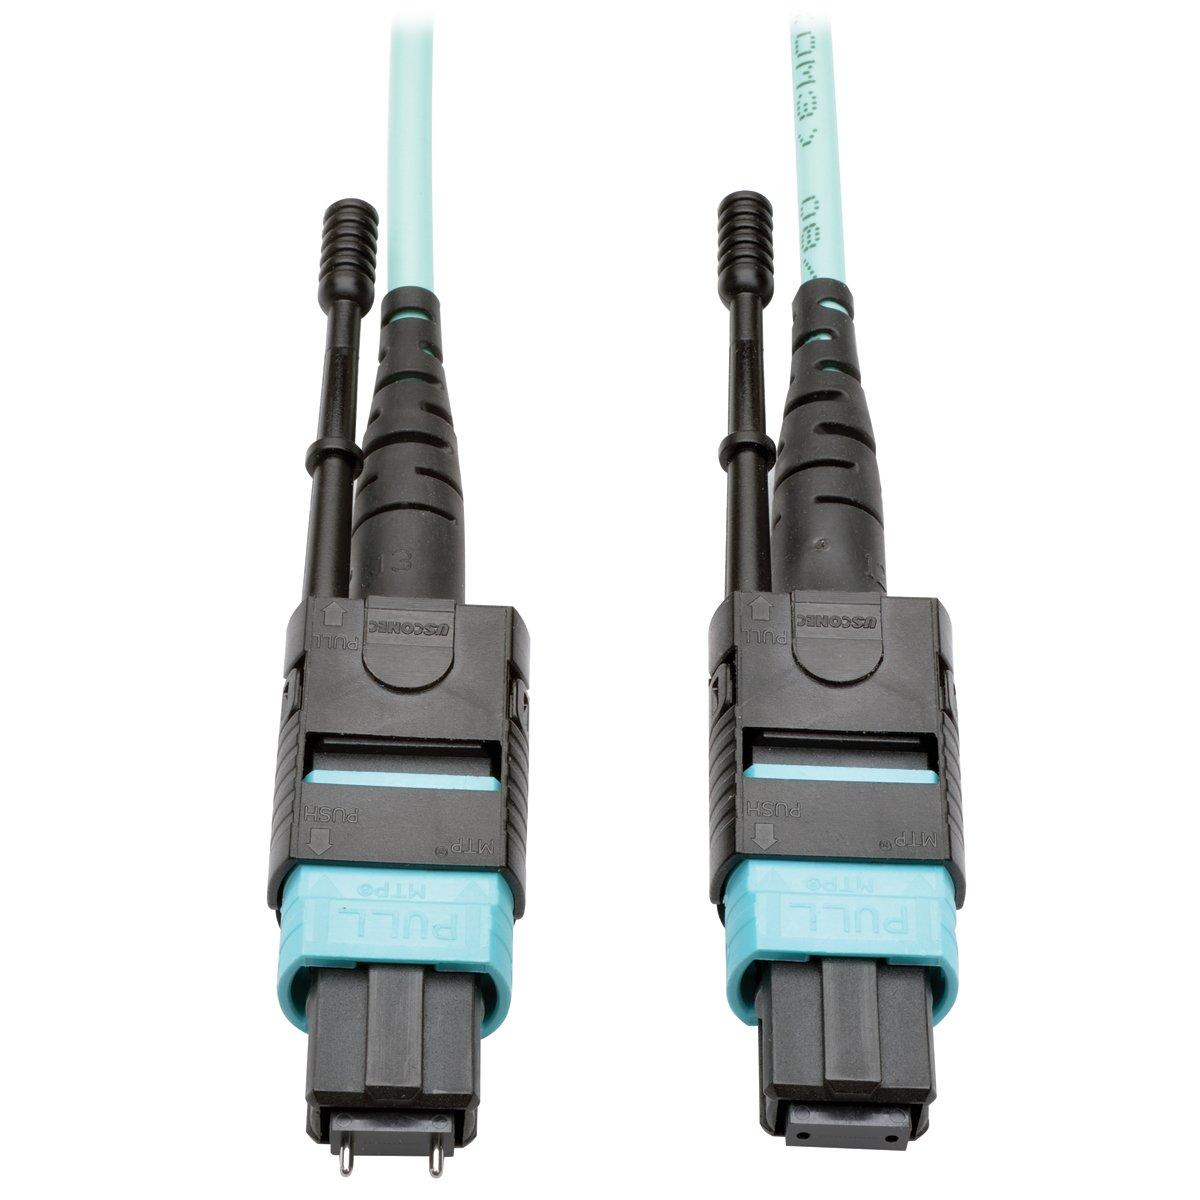 Tripp Lite 16' MTP/MPO Multimode Patch Cable, 12 Fiber, 40GbE, 40 GBASE-SR4, OM3 Plenum-Rated (M/F), Aqua, 5 m 16 ft. (N842-05M-12-MF)